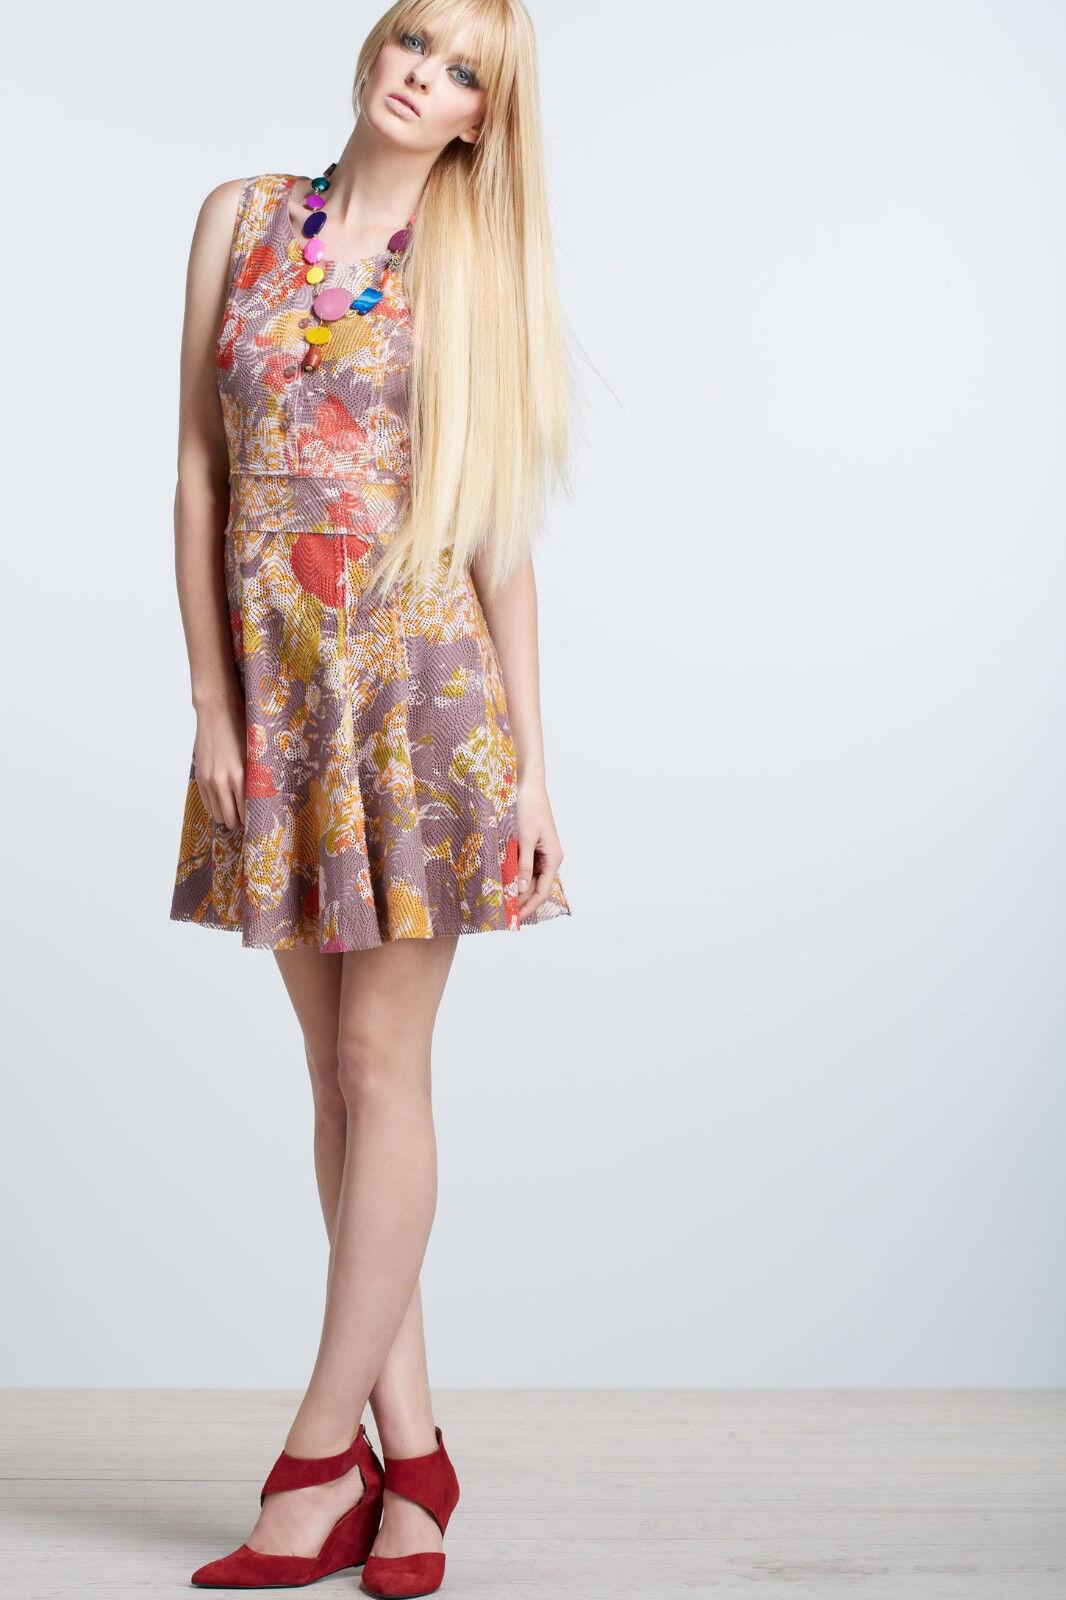 NWT Anthropologie New Smoky Lilies Lace Dress  Sizes  8 12